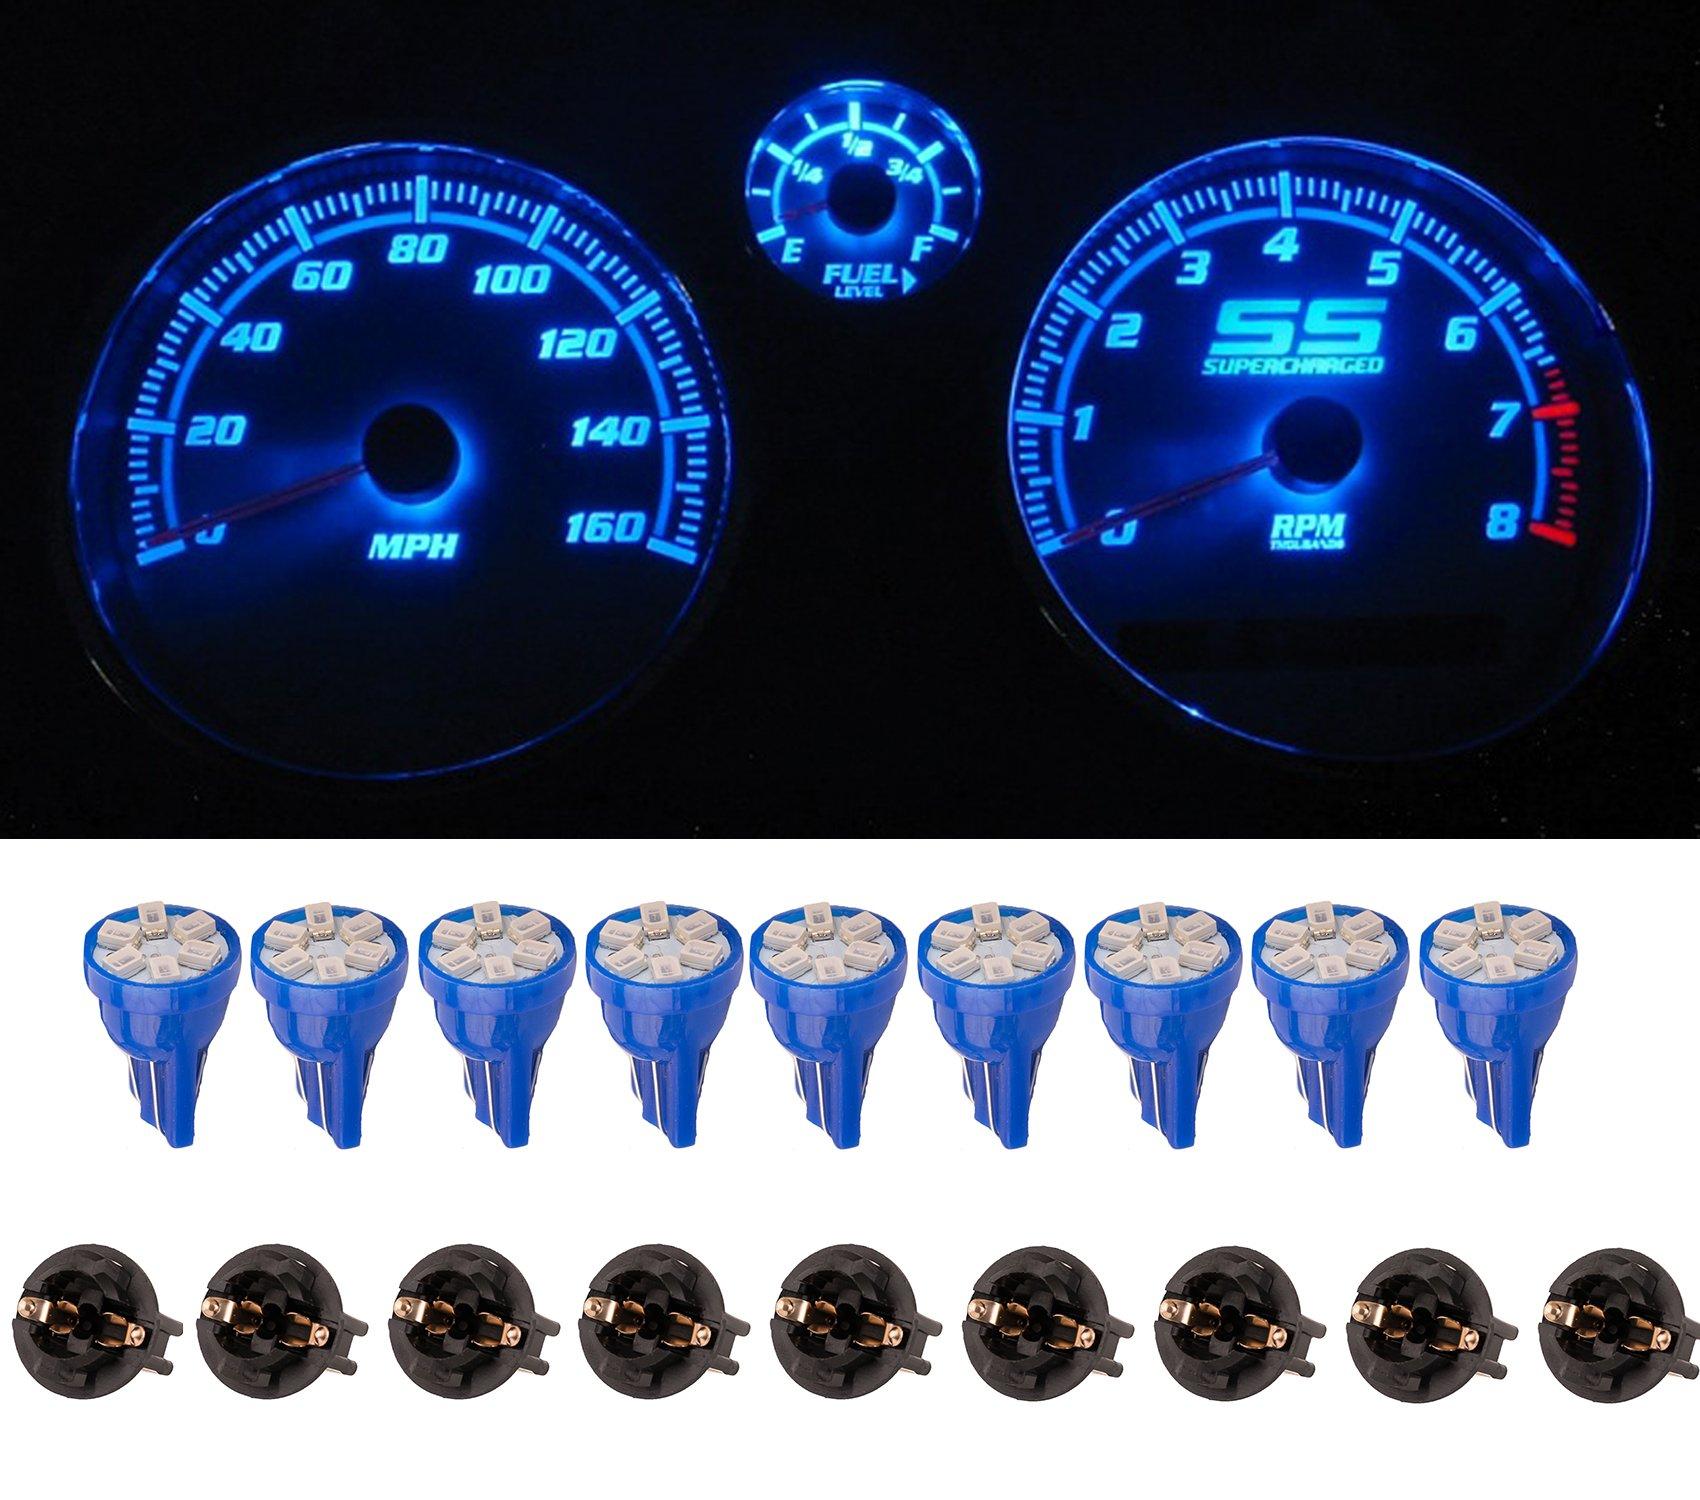 10X Blue Round Diode LED W//Socket T10 PC194 168 Instrument Dash Gauge Light Bulb